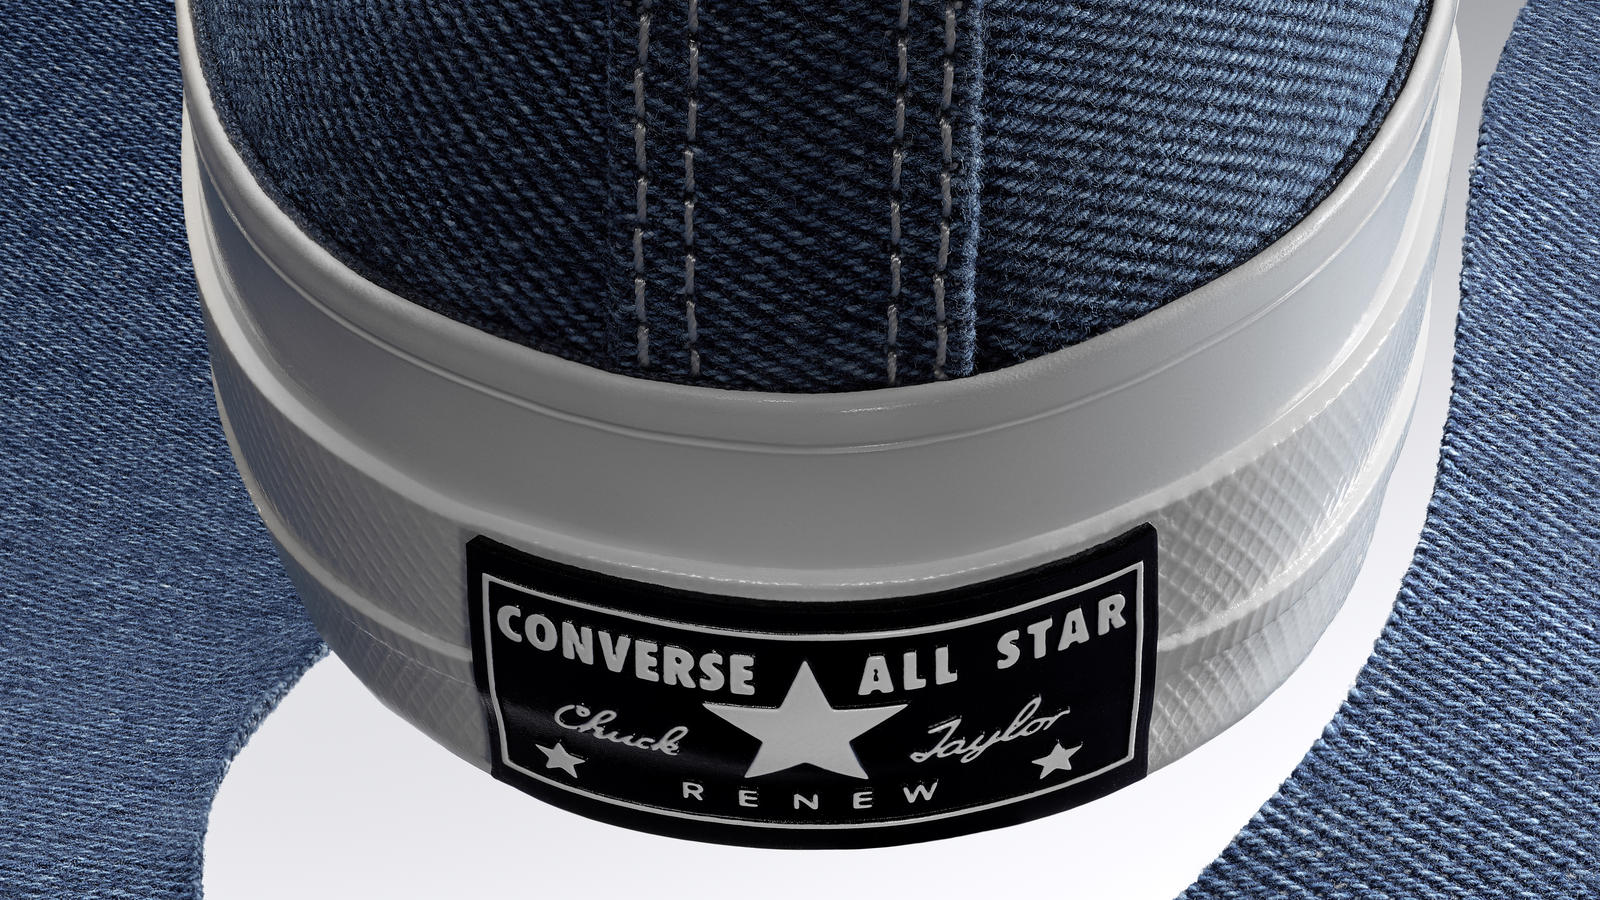 Converse Renew Denim Chuck 70 Collection Nike News